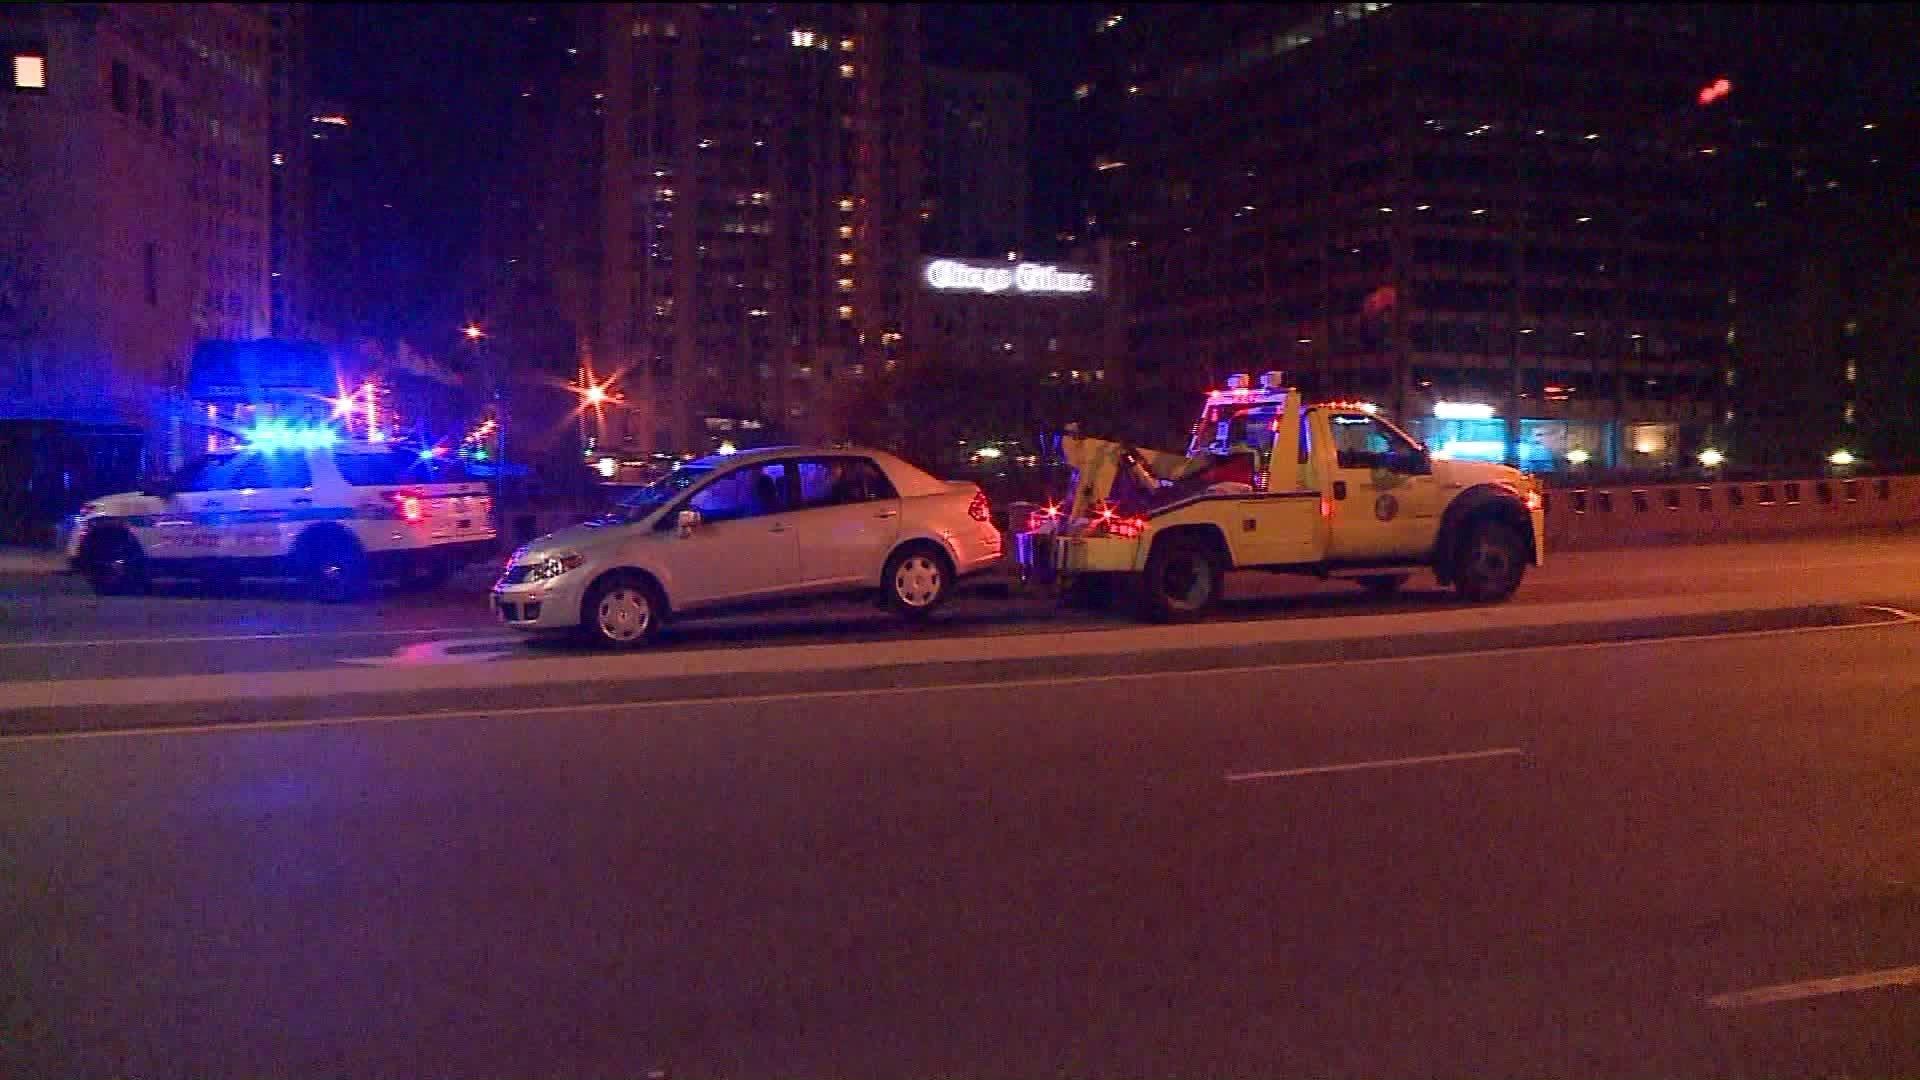 3 hurt after CTA bus, car crash on Michigan Avenue - Chicago